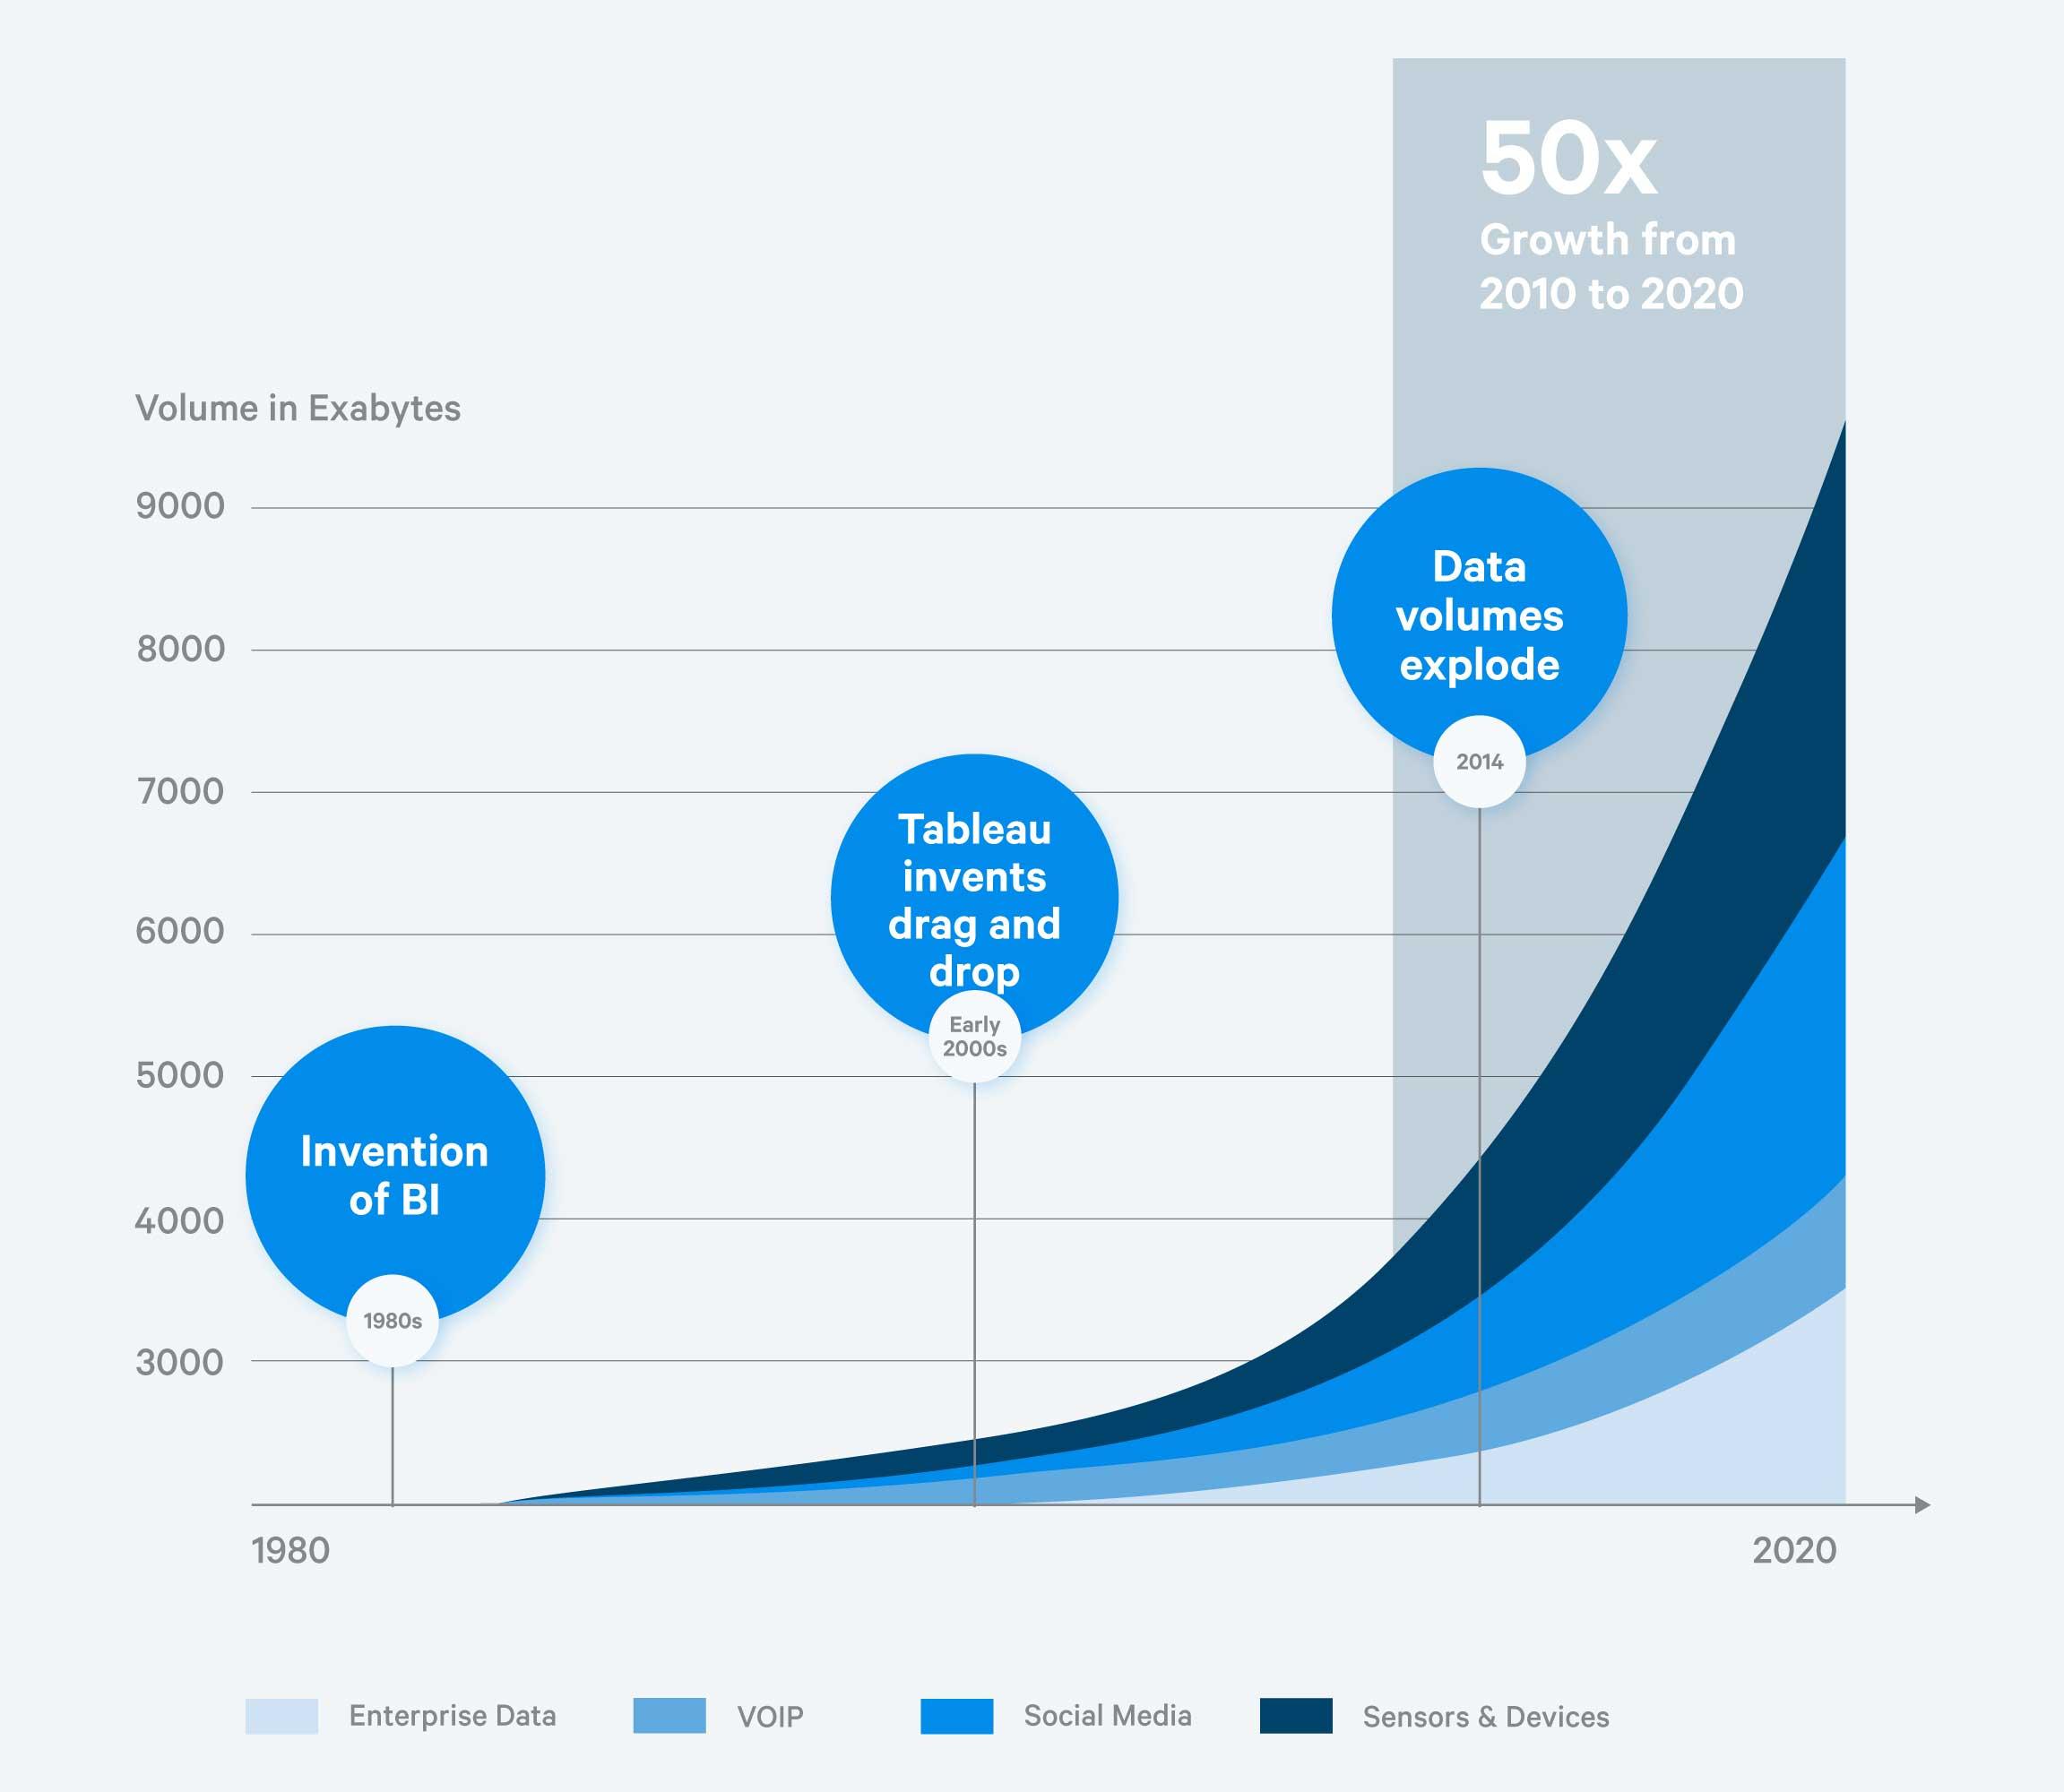 Data volume growth